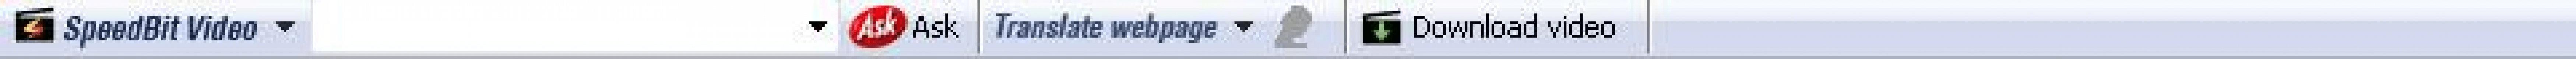 SpeedBit Video Toolbar